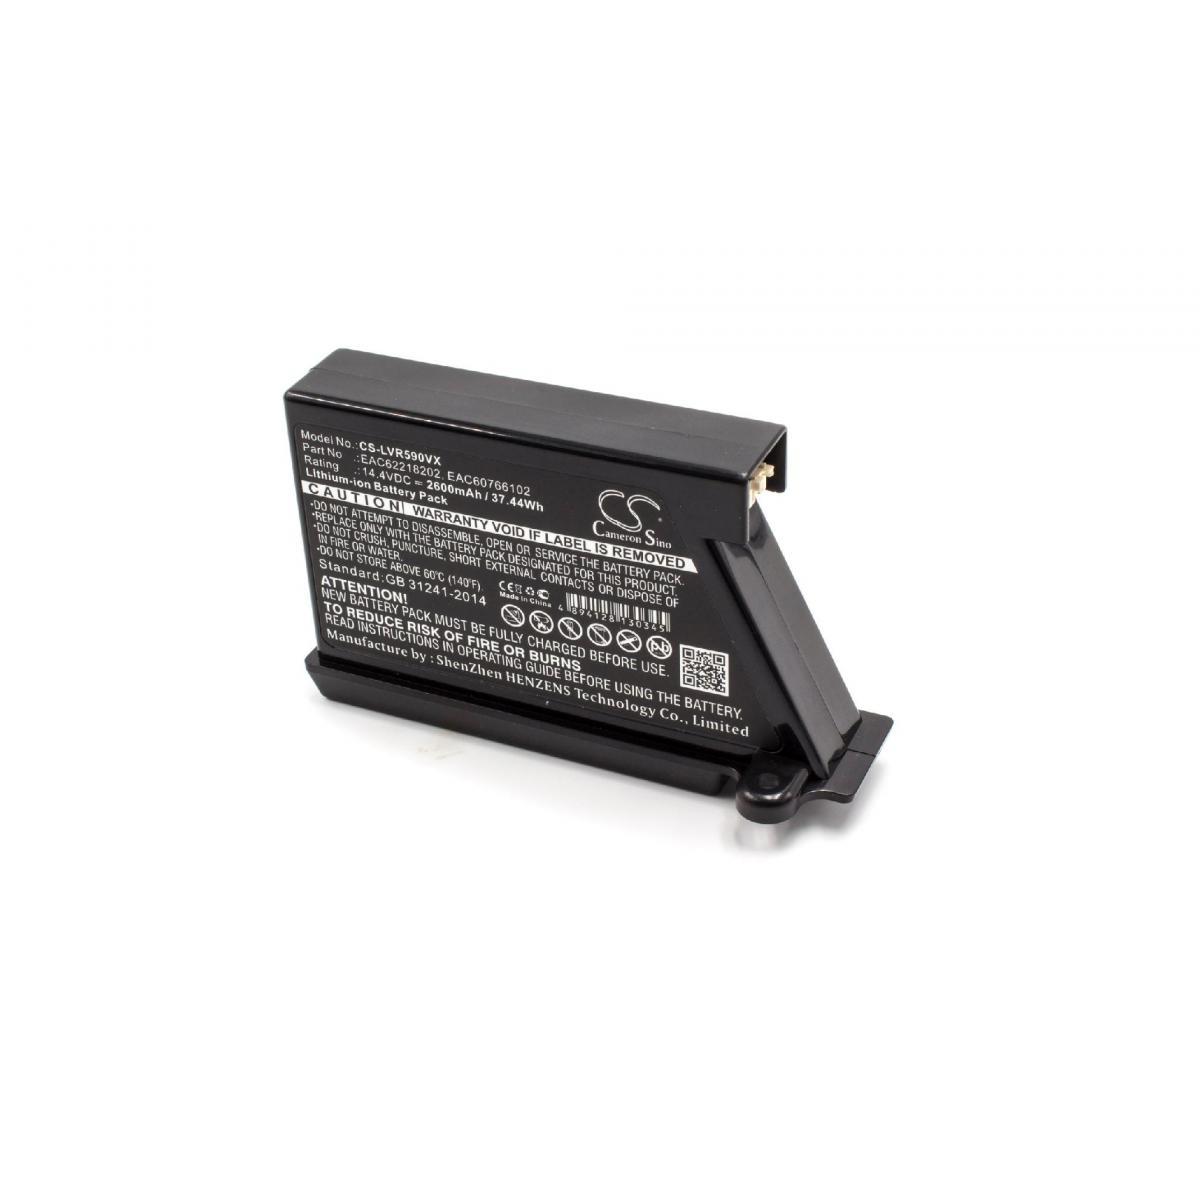 Vhbw vhbw Batterie compatible avec LG HOM-BOT VR7428SP, VR8600RB, VR8600RR, VRF4042 robot électroménager (2600mAh, 14,4V, Li-